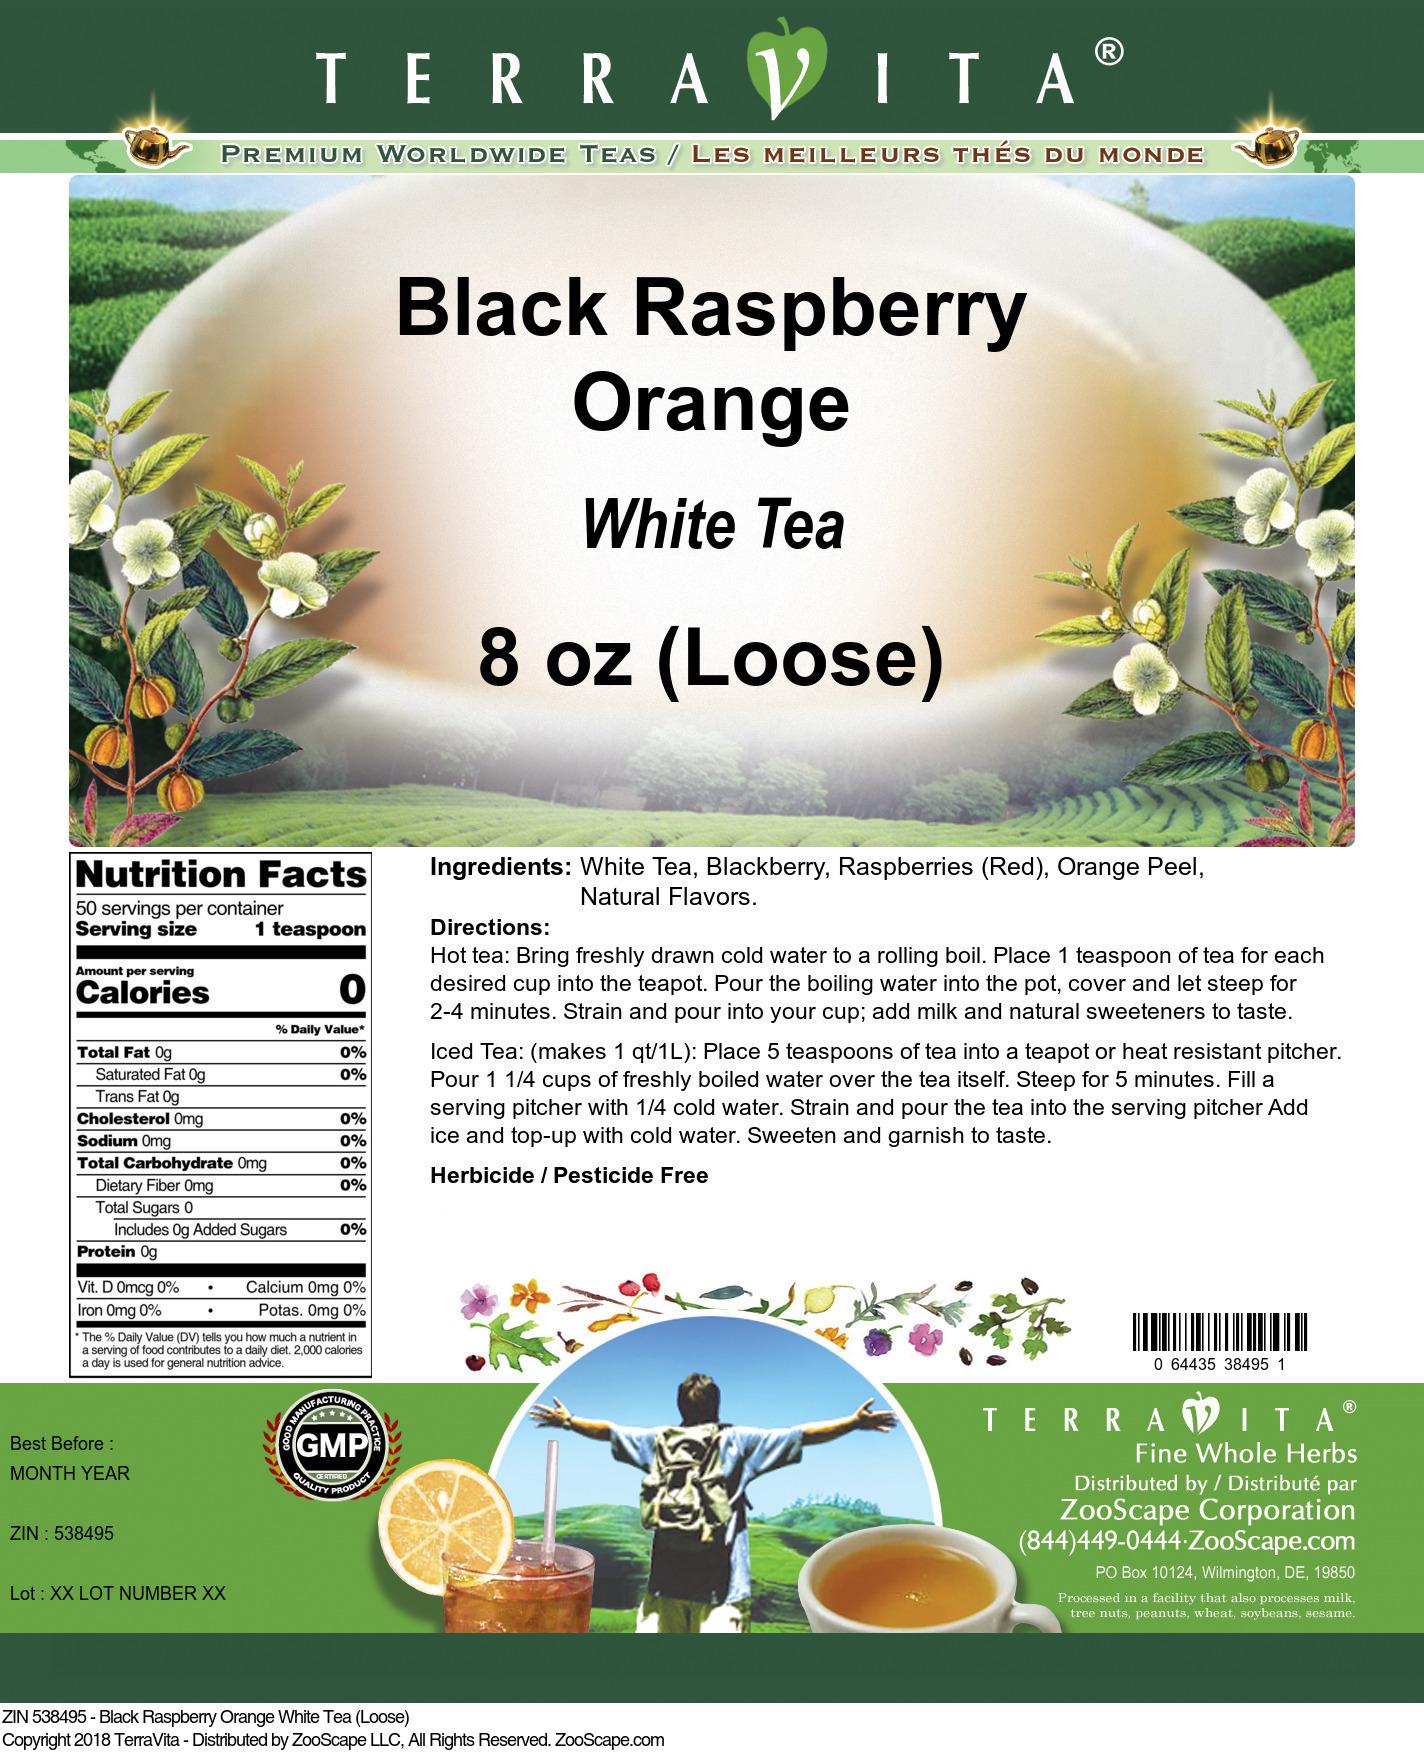 Black Raspberry Orange White Tea (Loose)